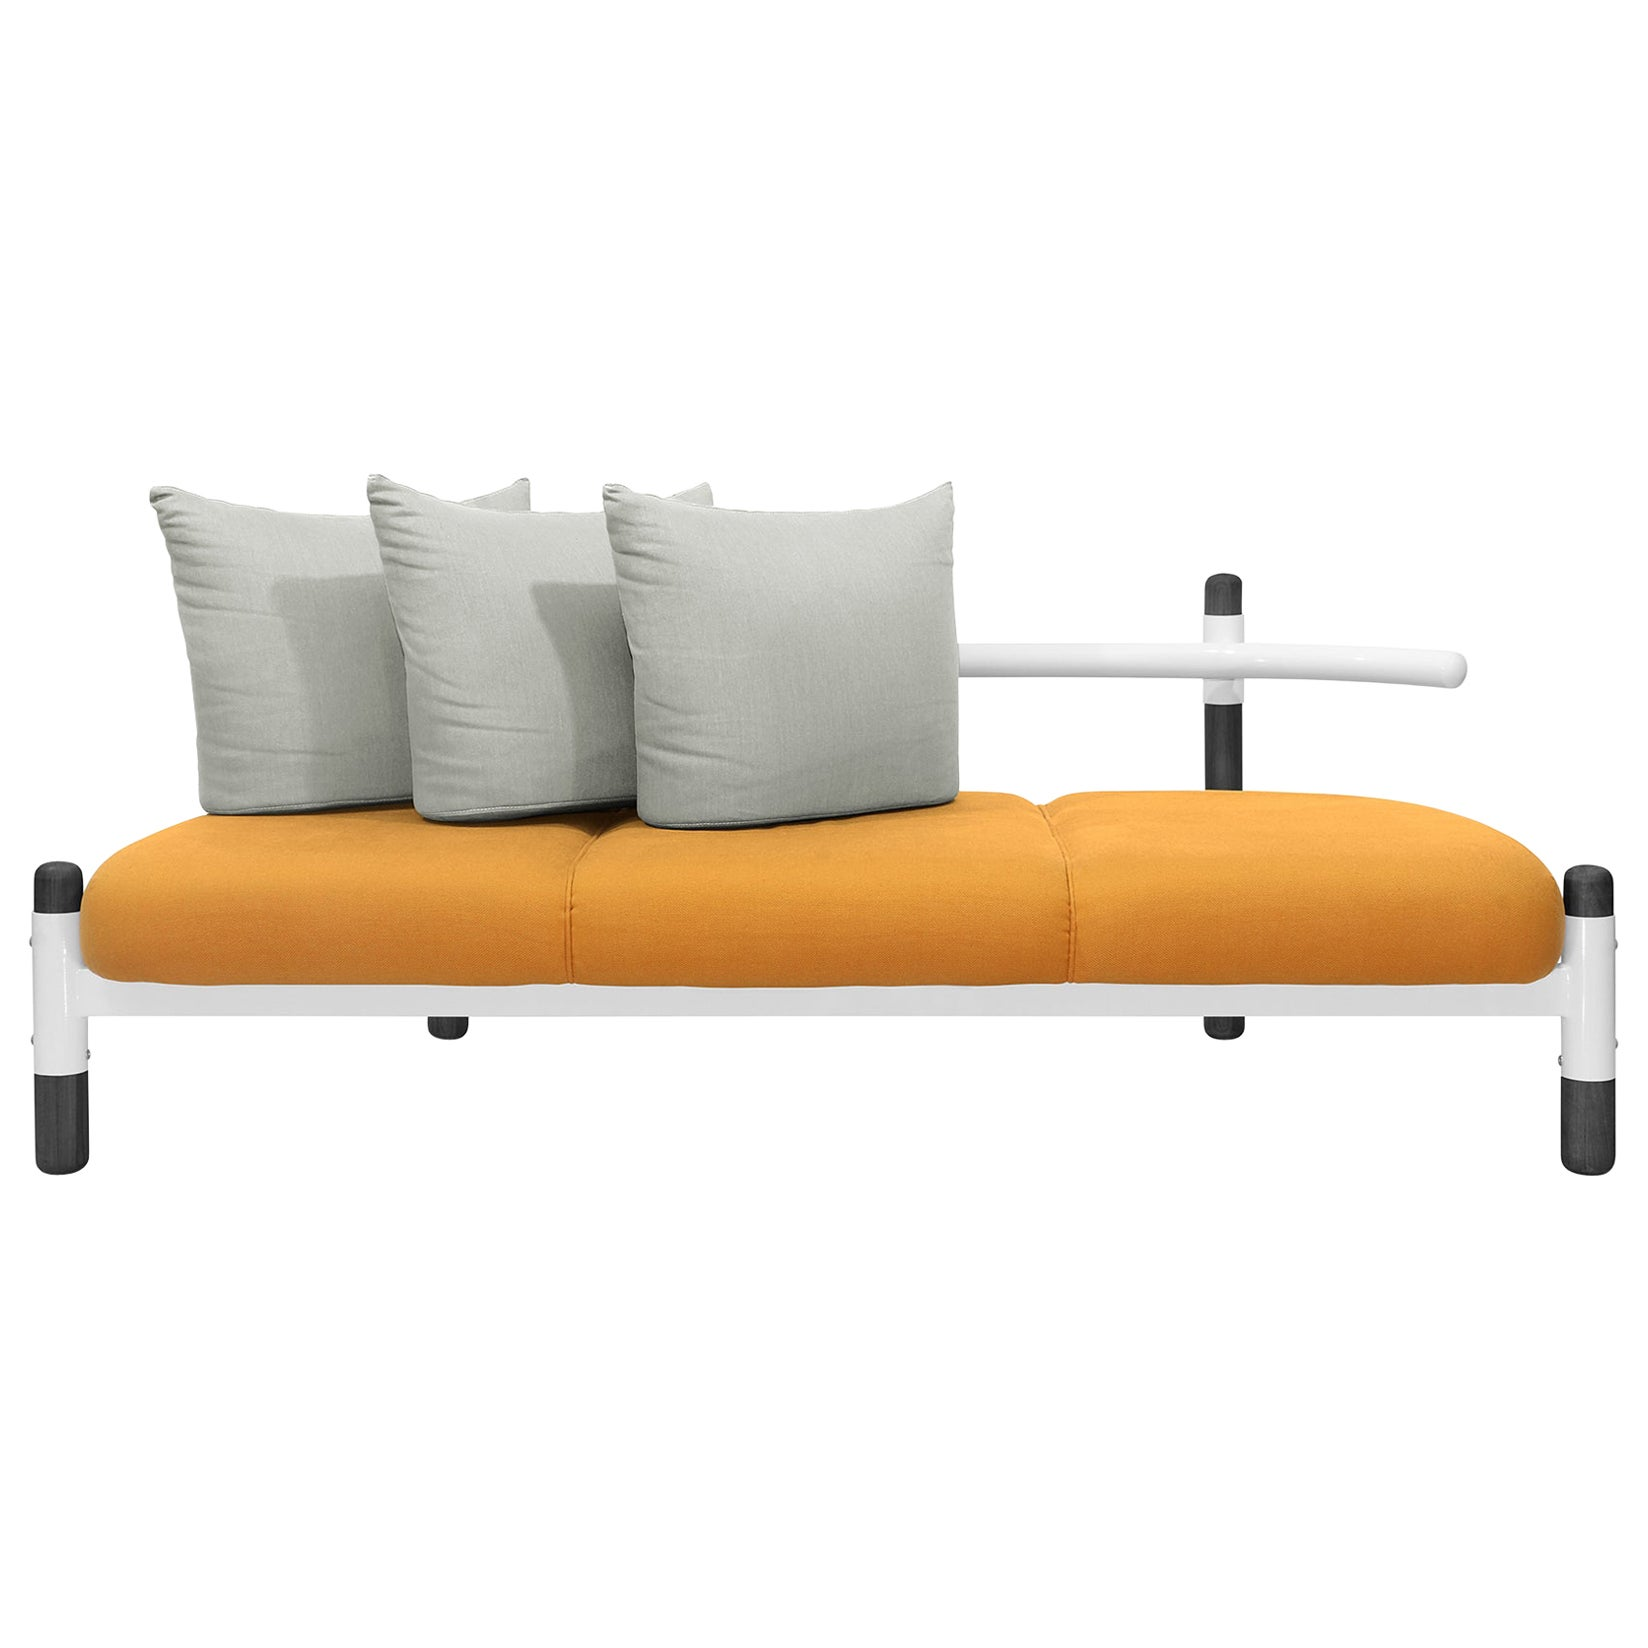 Orange PK15 Three-Seat Sofa, Steel Structure and Ebonized Legs by Paulo Kobylka